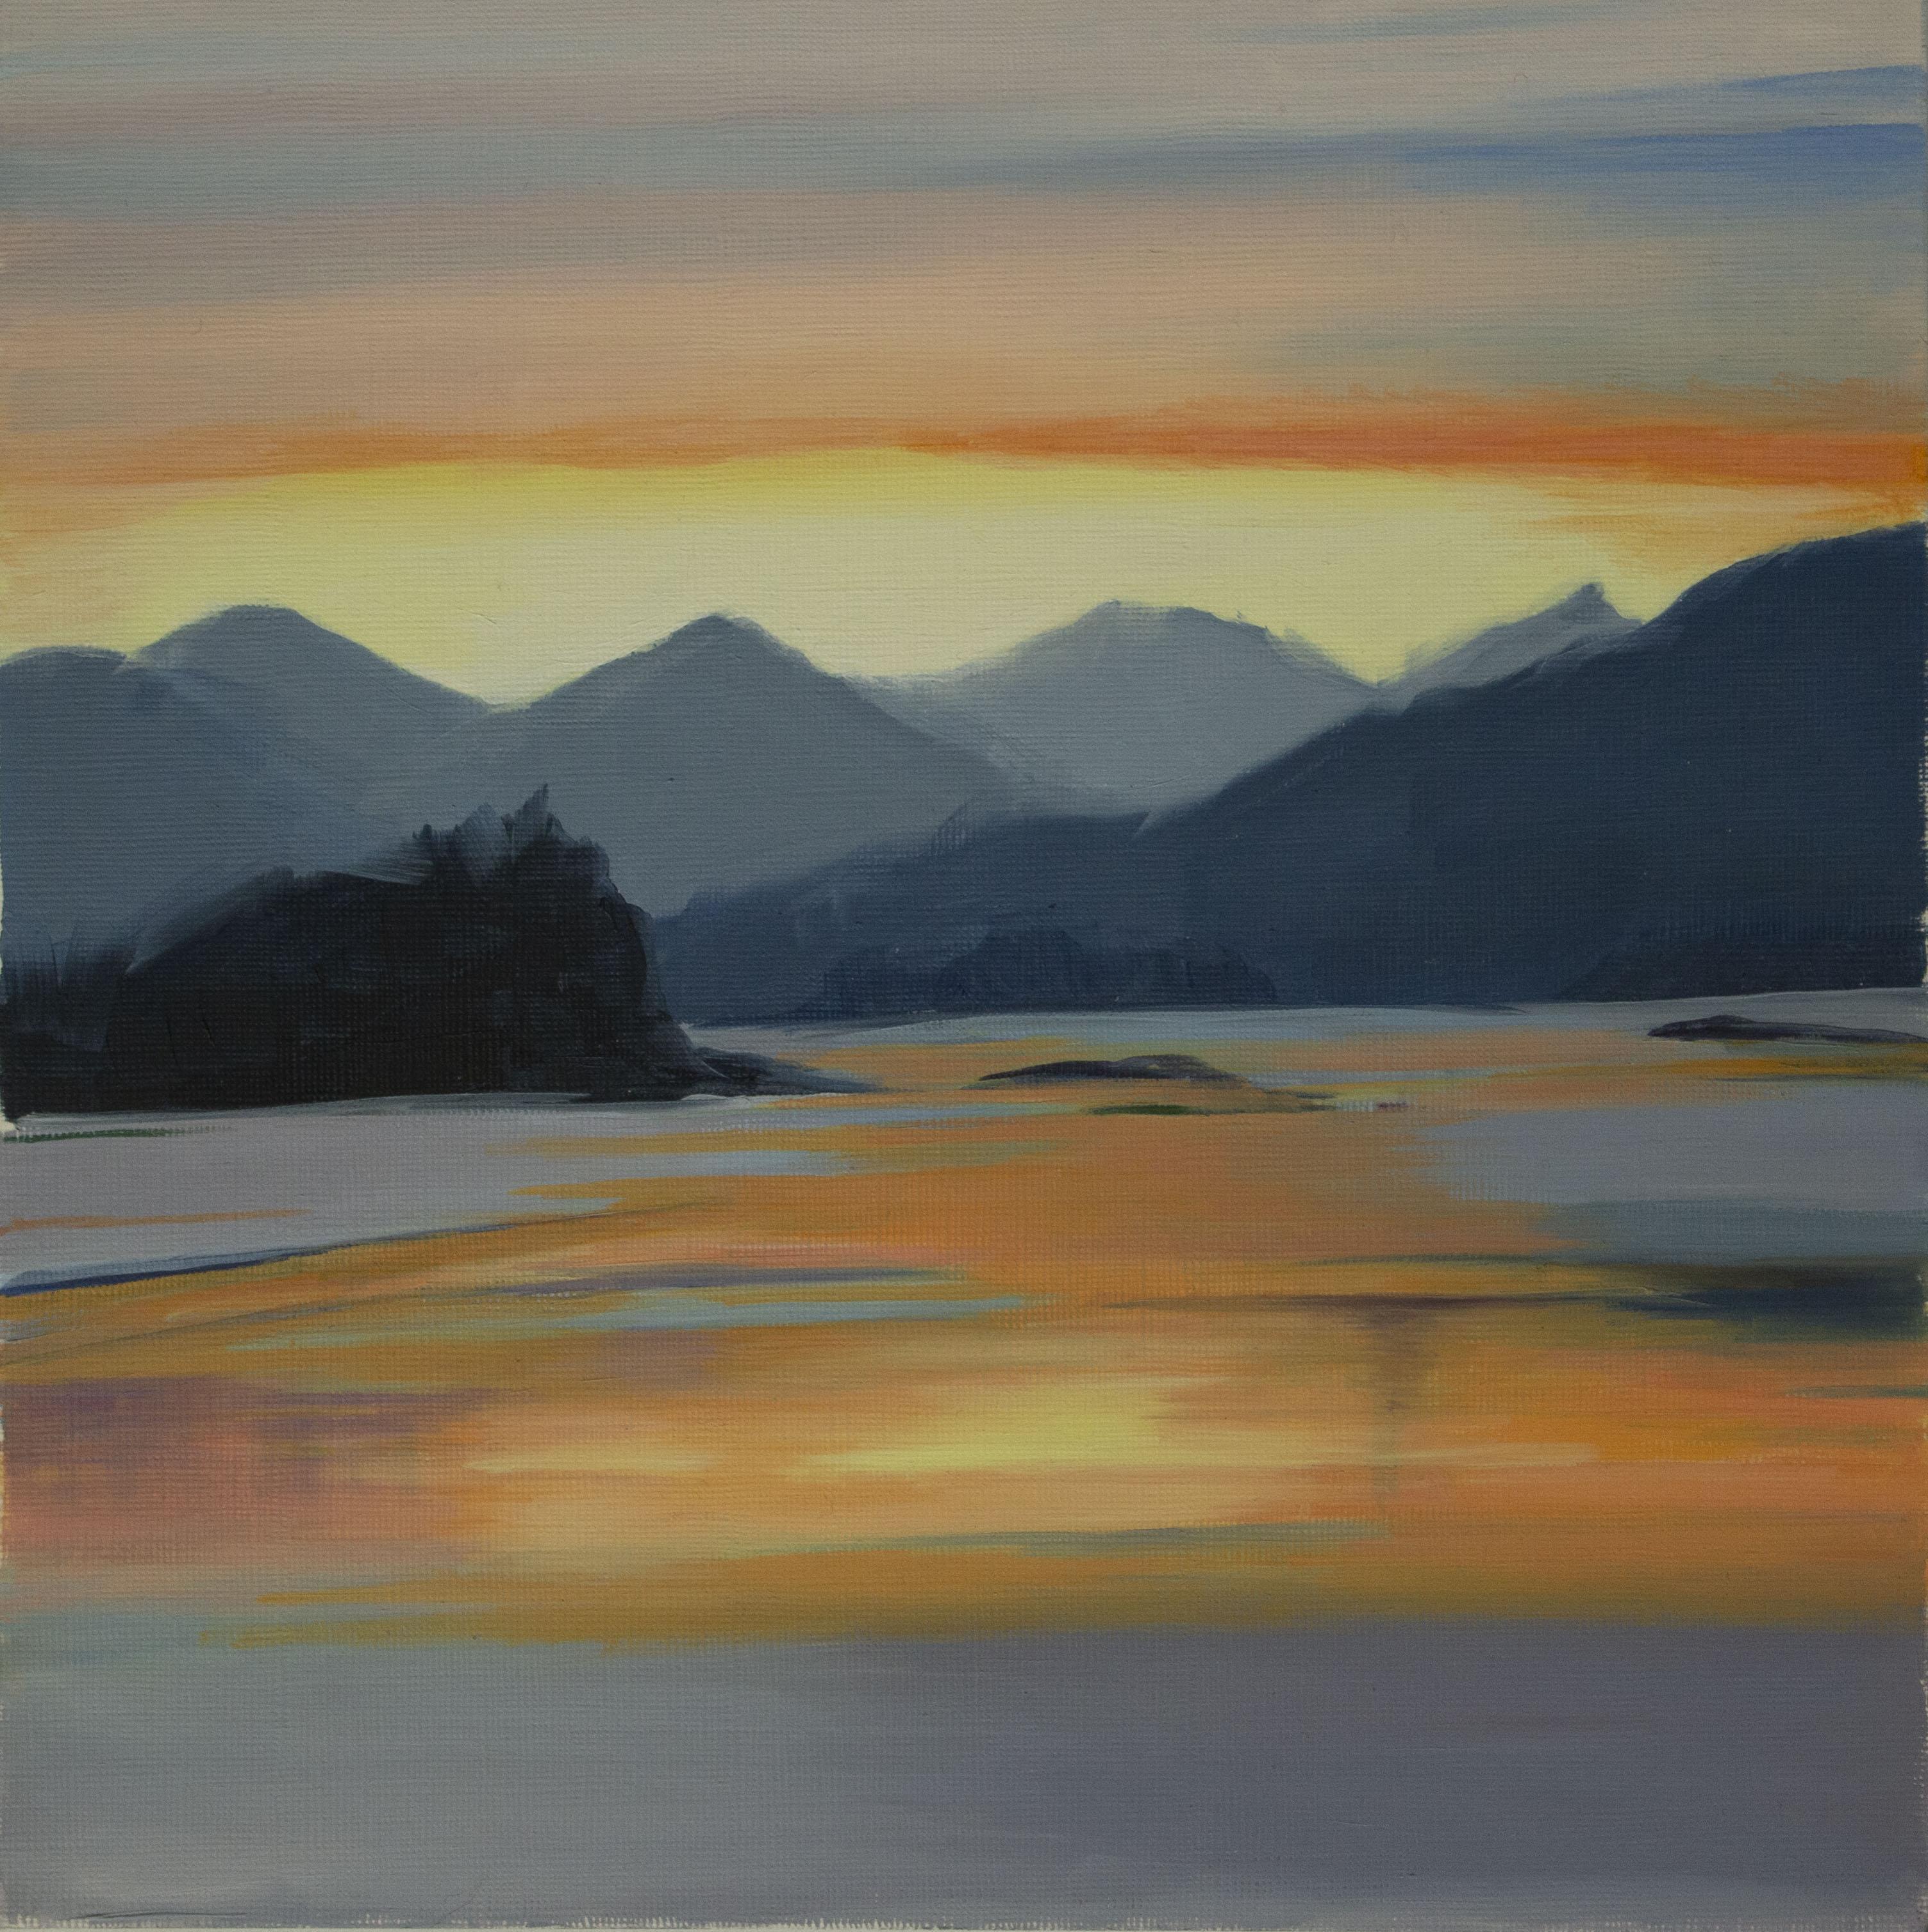 Mountain Lake Sunset, Oil, 25x26cm, 2019